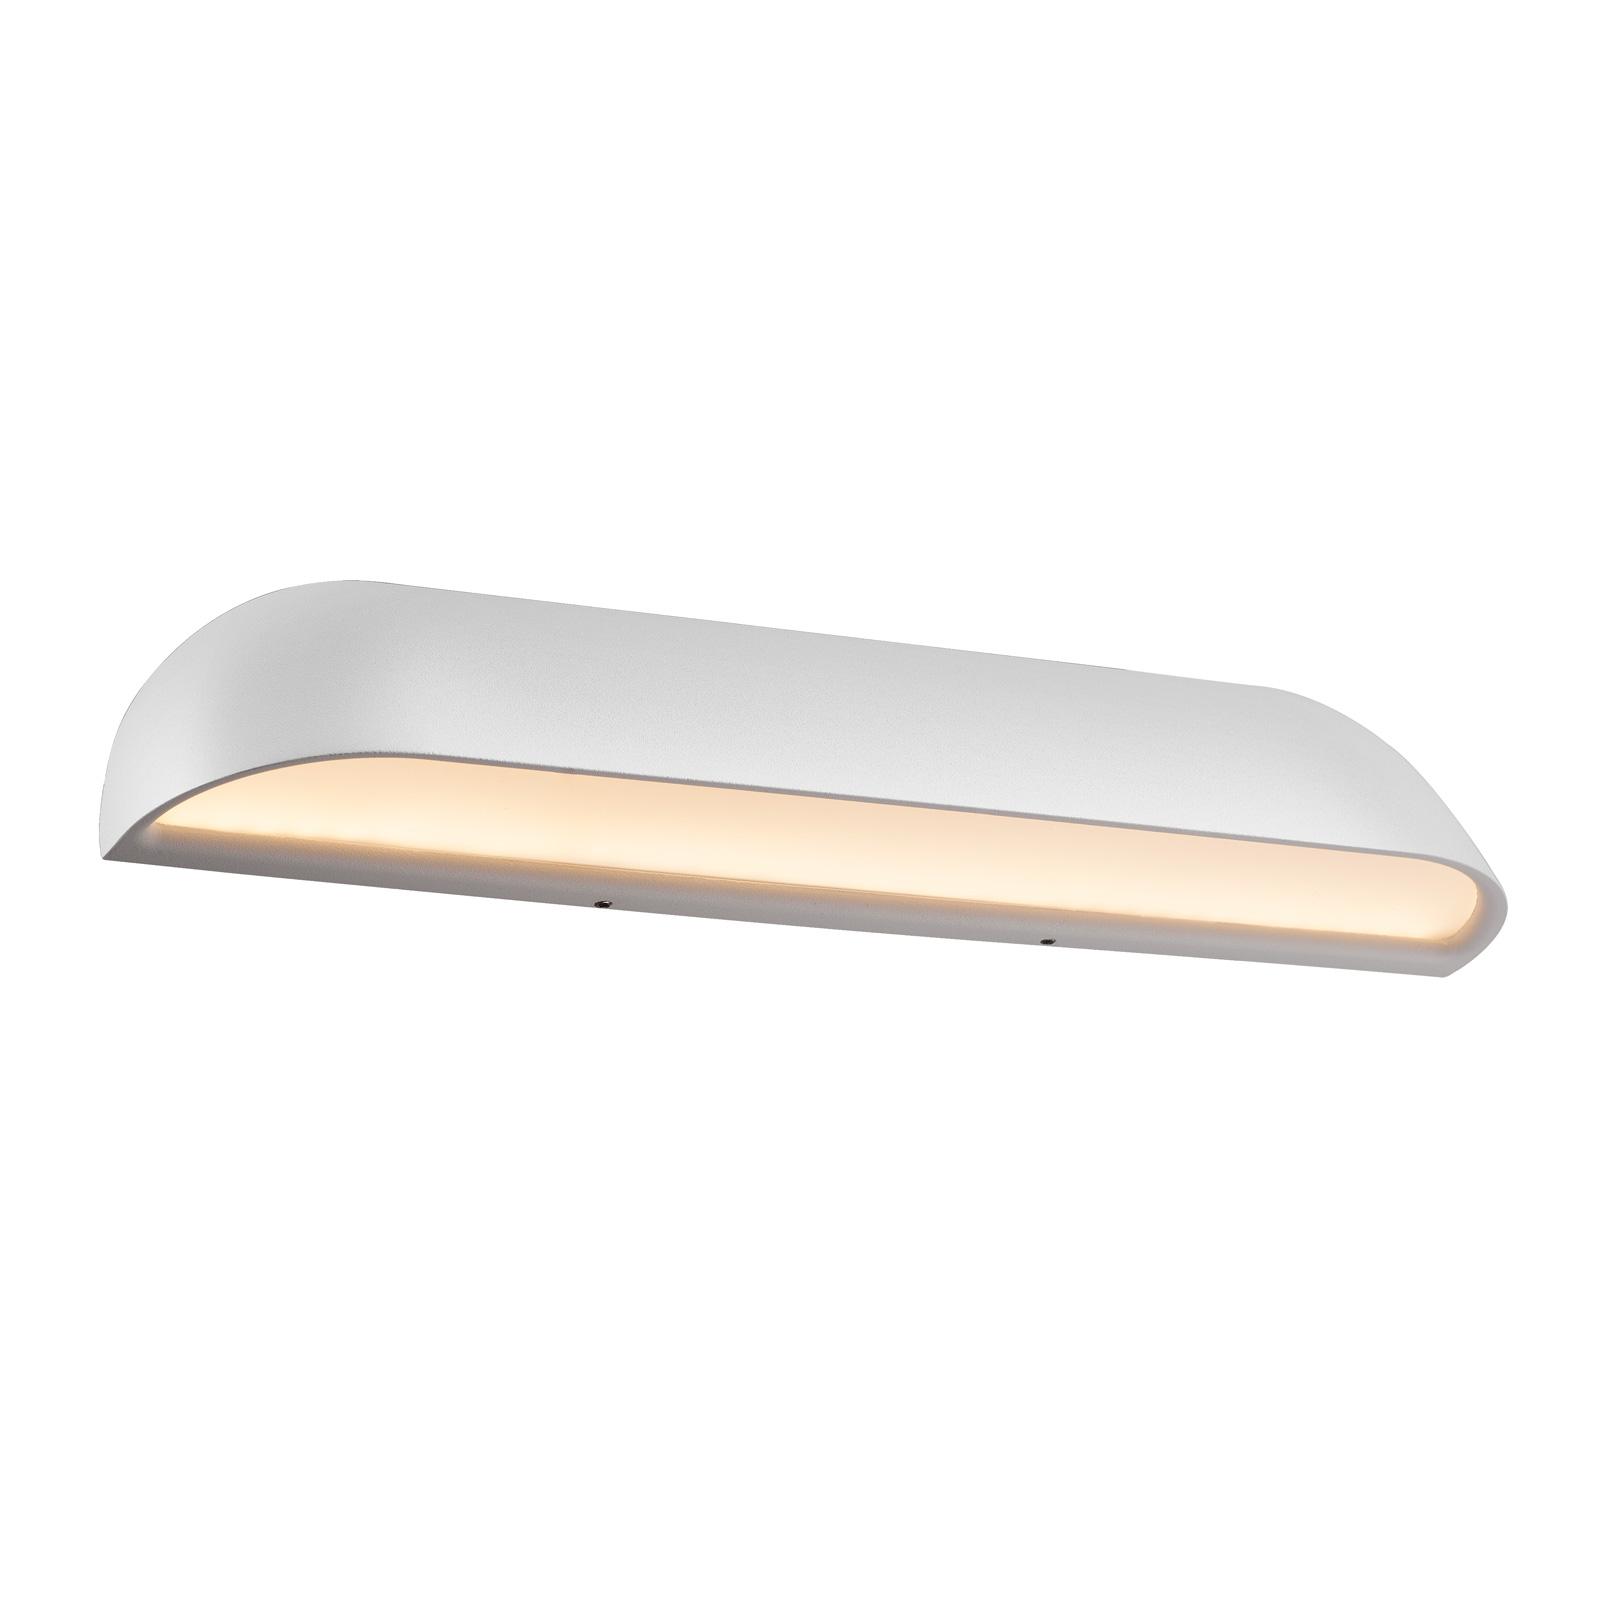 Applique LED da esterni Front 36, bianco